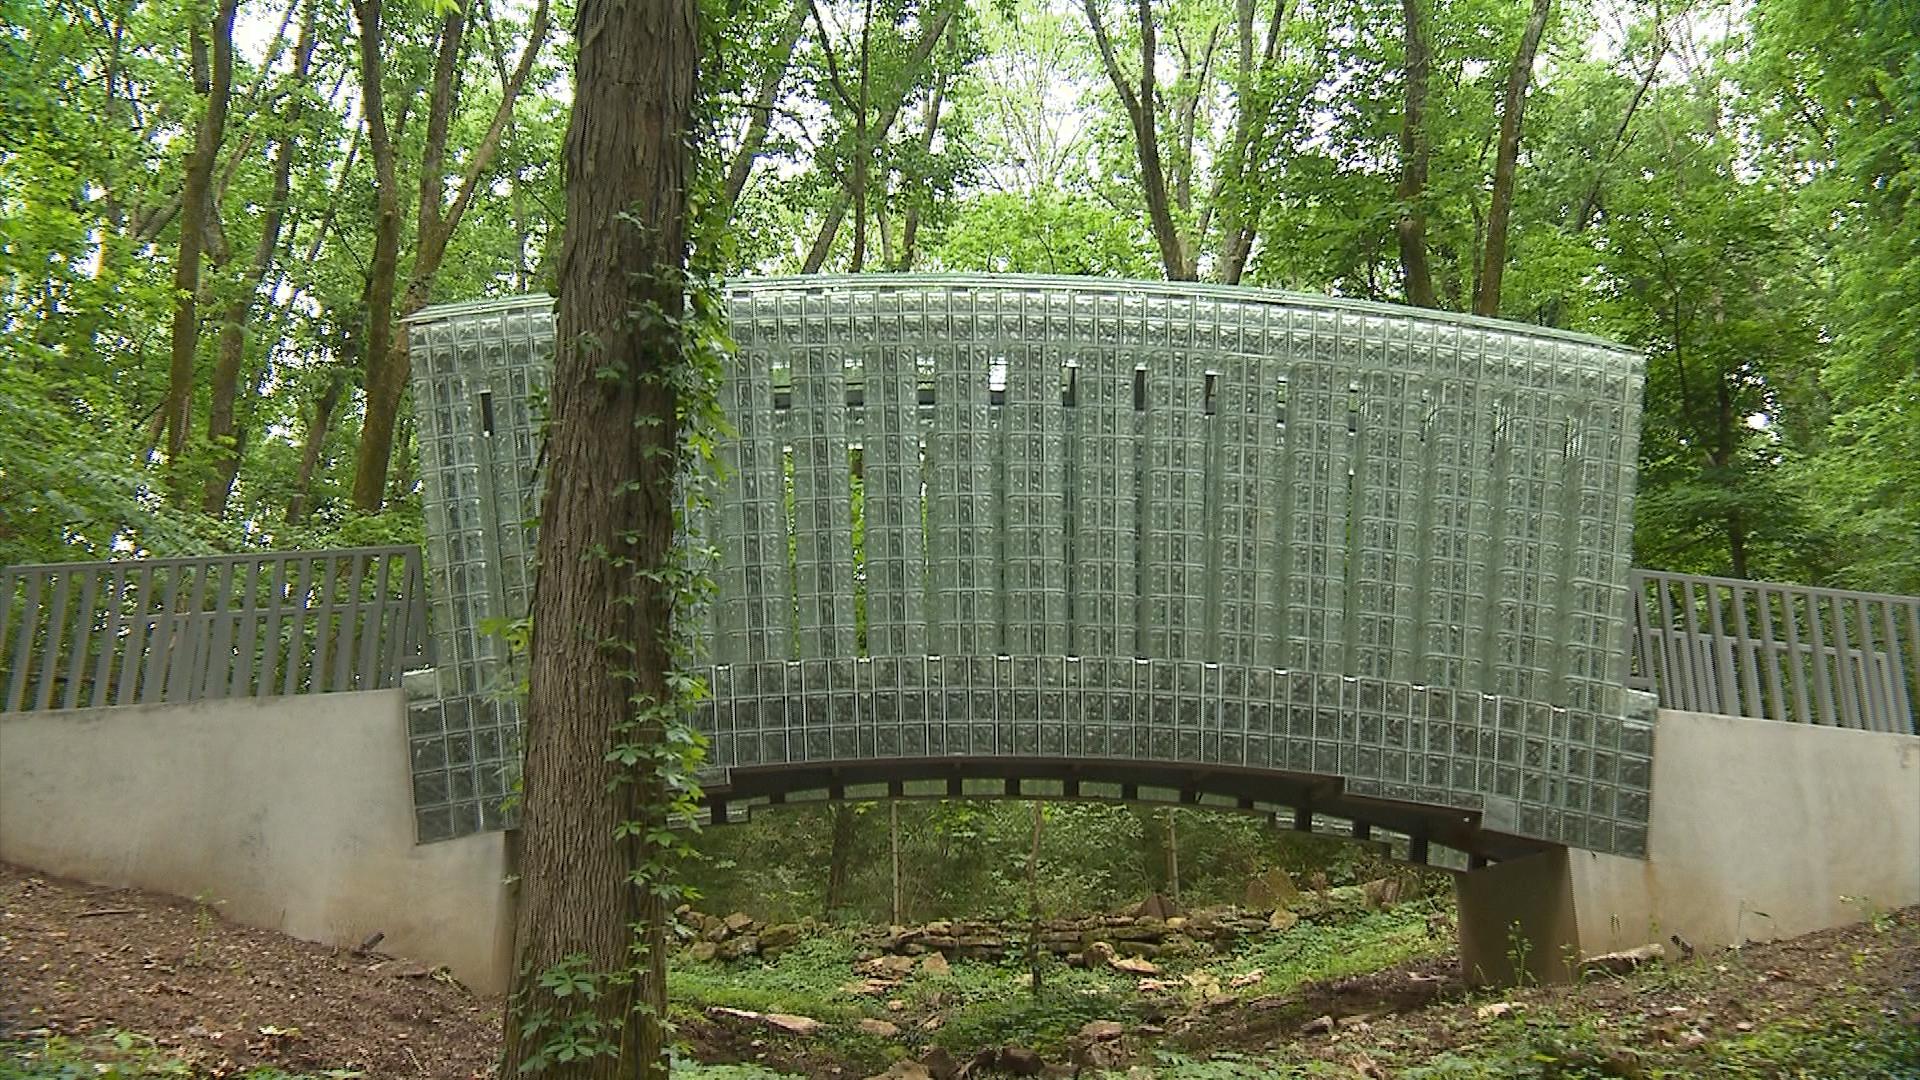 Monroe Carell Jr. Family Sculpture Trail Cheekwood